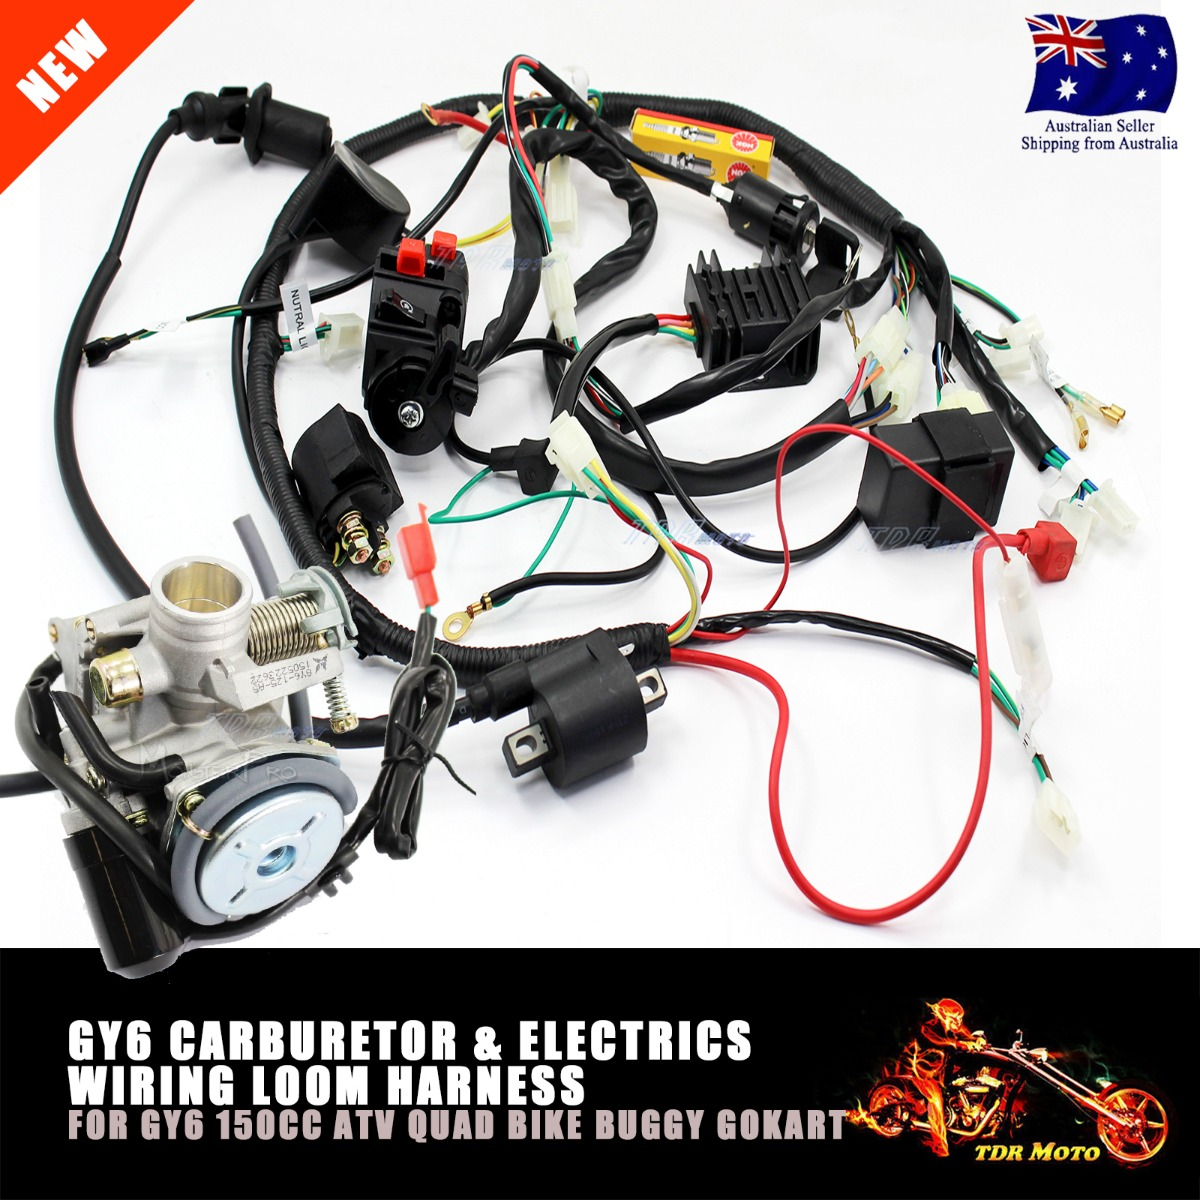 gy cc atv quad buggy carby carburetor wire harness wiring gy6 150cc atv quad buggy carby carburetor wire harness wiring harness solenoid